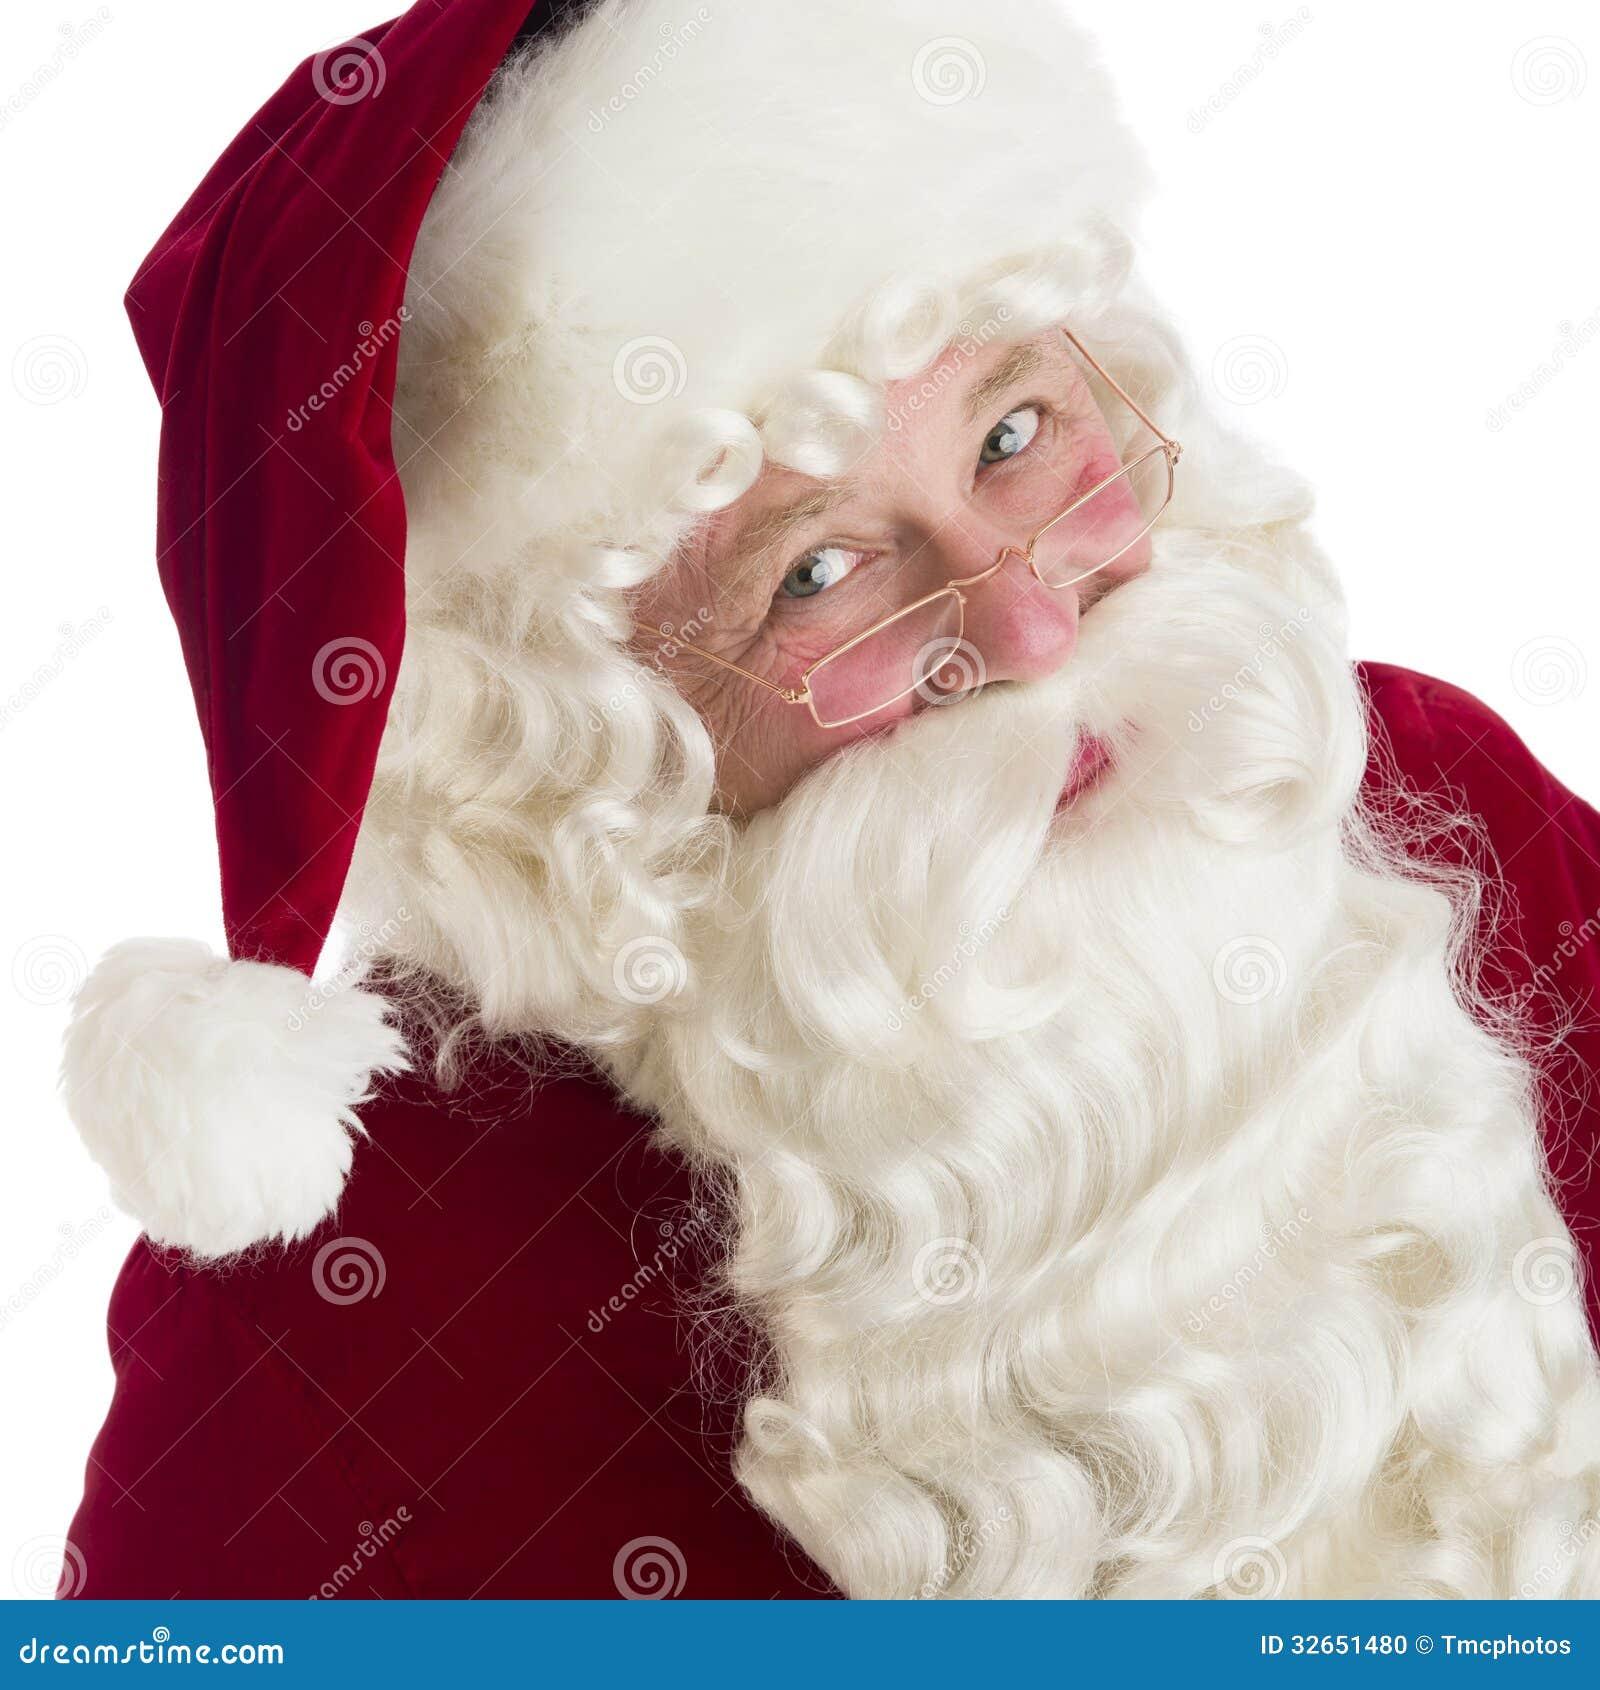 closeup portrait of santa claus - White Santa Claus